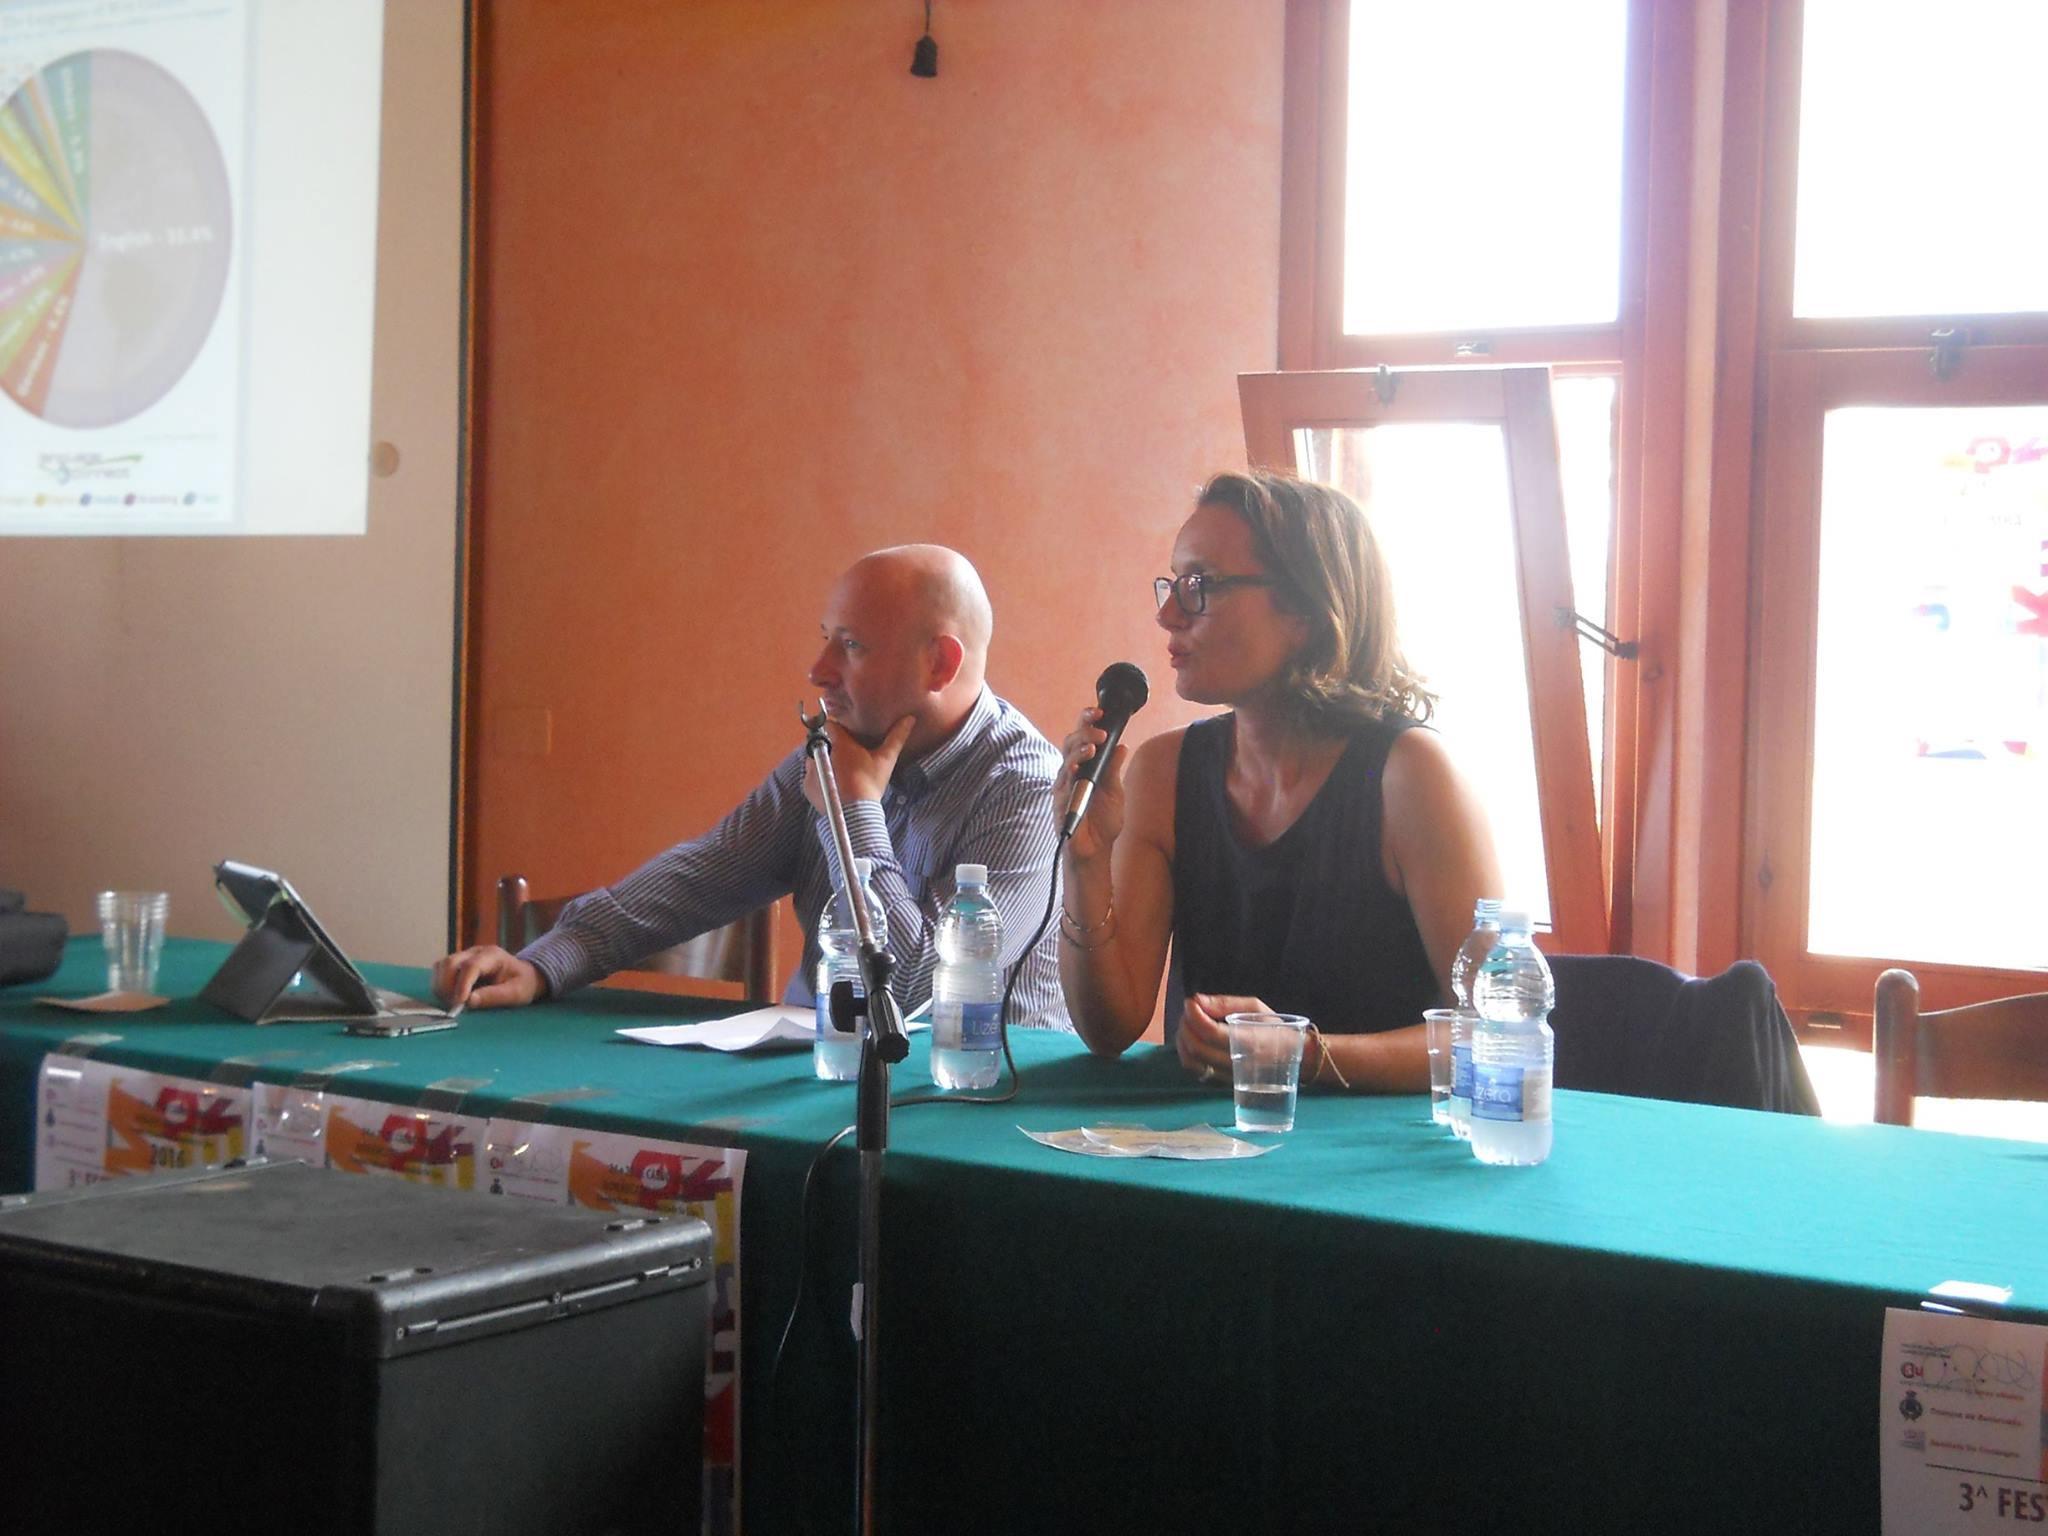 Festa de sa Limba Ufitziale - Bonàrcadu - Roberto Carta (CSU) cun Claudia Soria (CNR-Pisa)